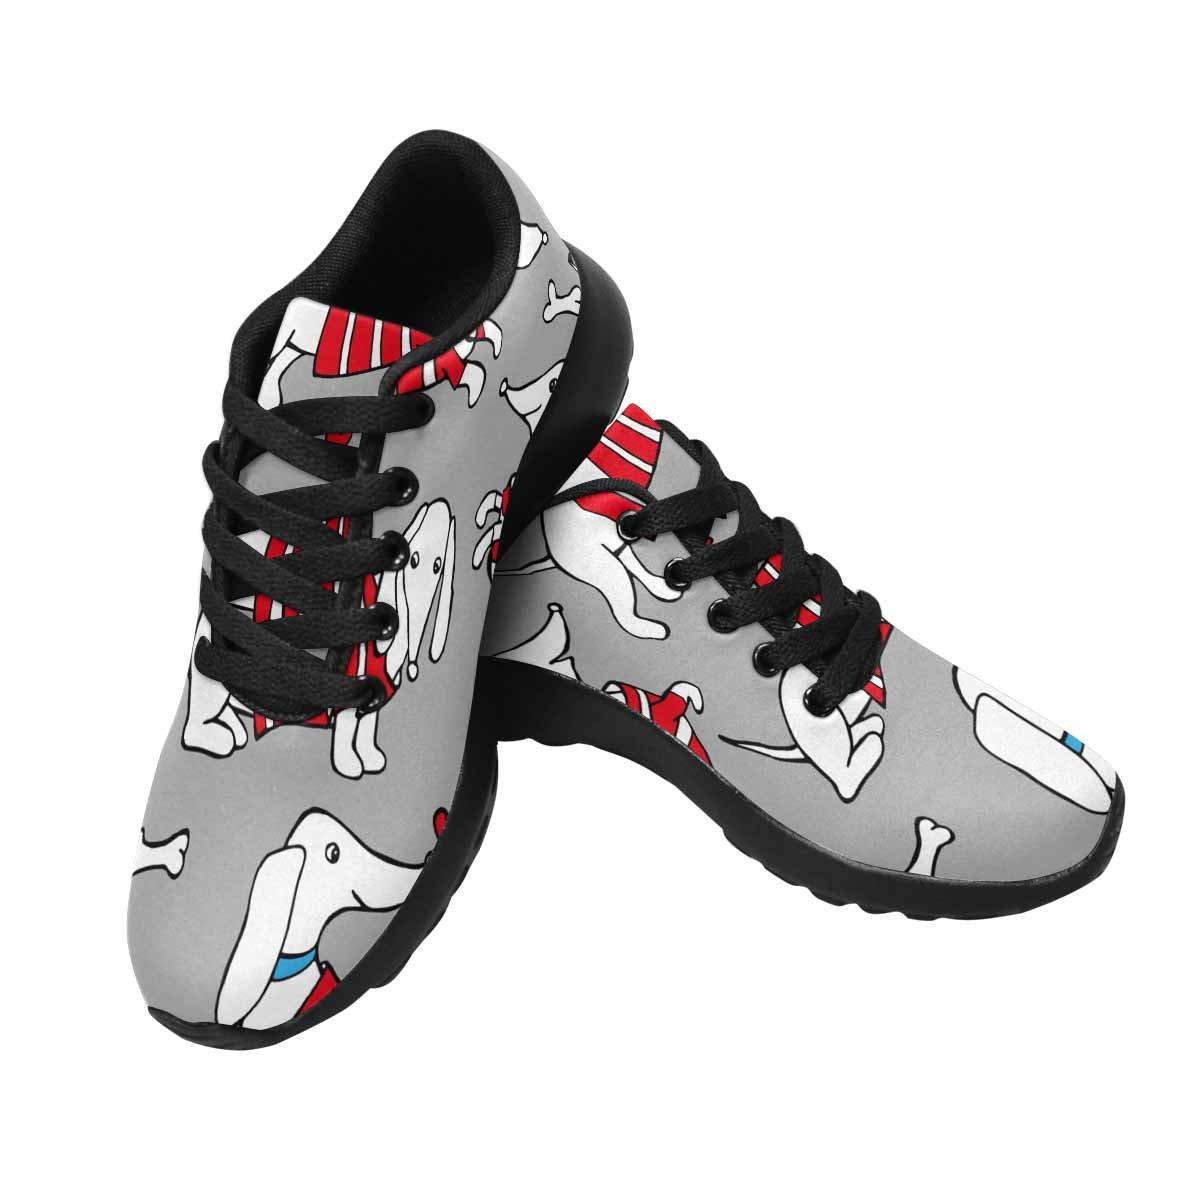 InterestPrint Women's Running Comfort Sports Athletic Shoes Dog Dachshund in Cardigan Brown 7 B(M) US